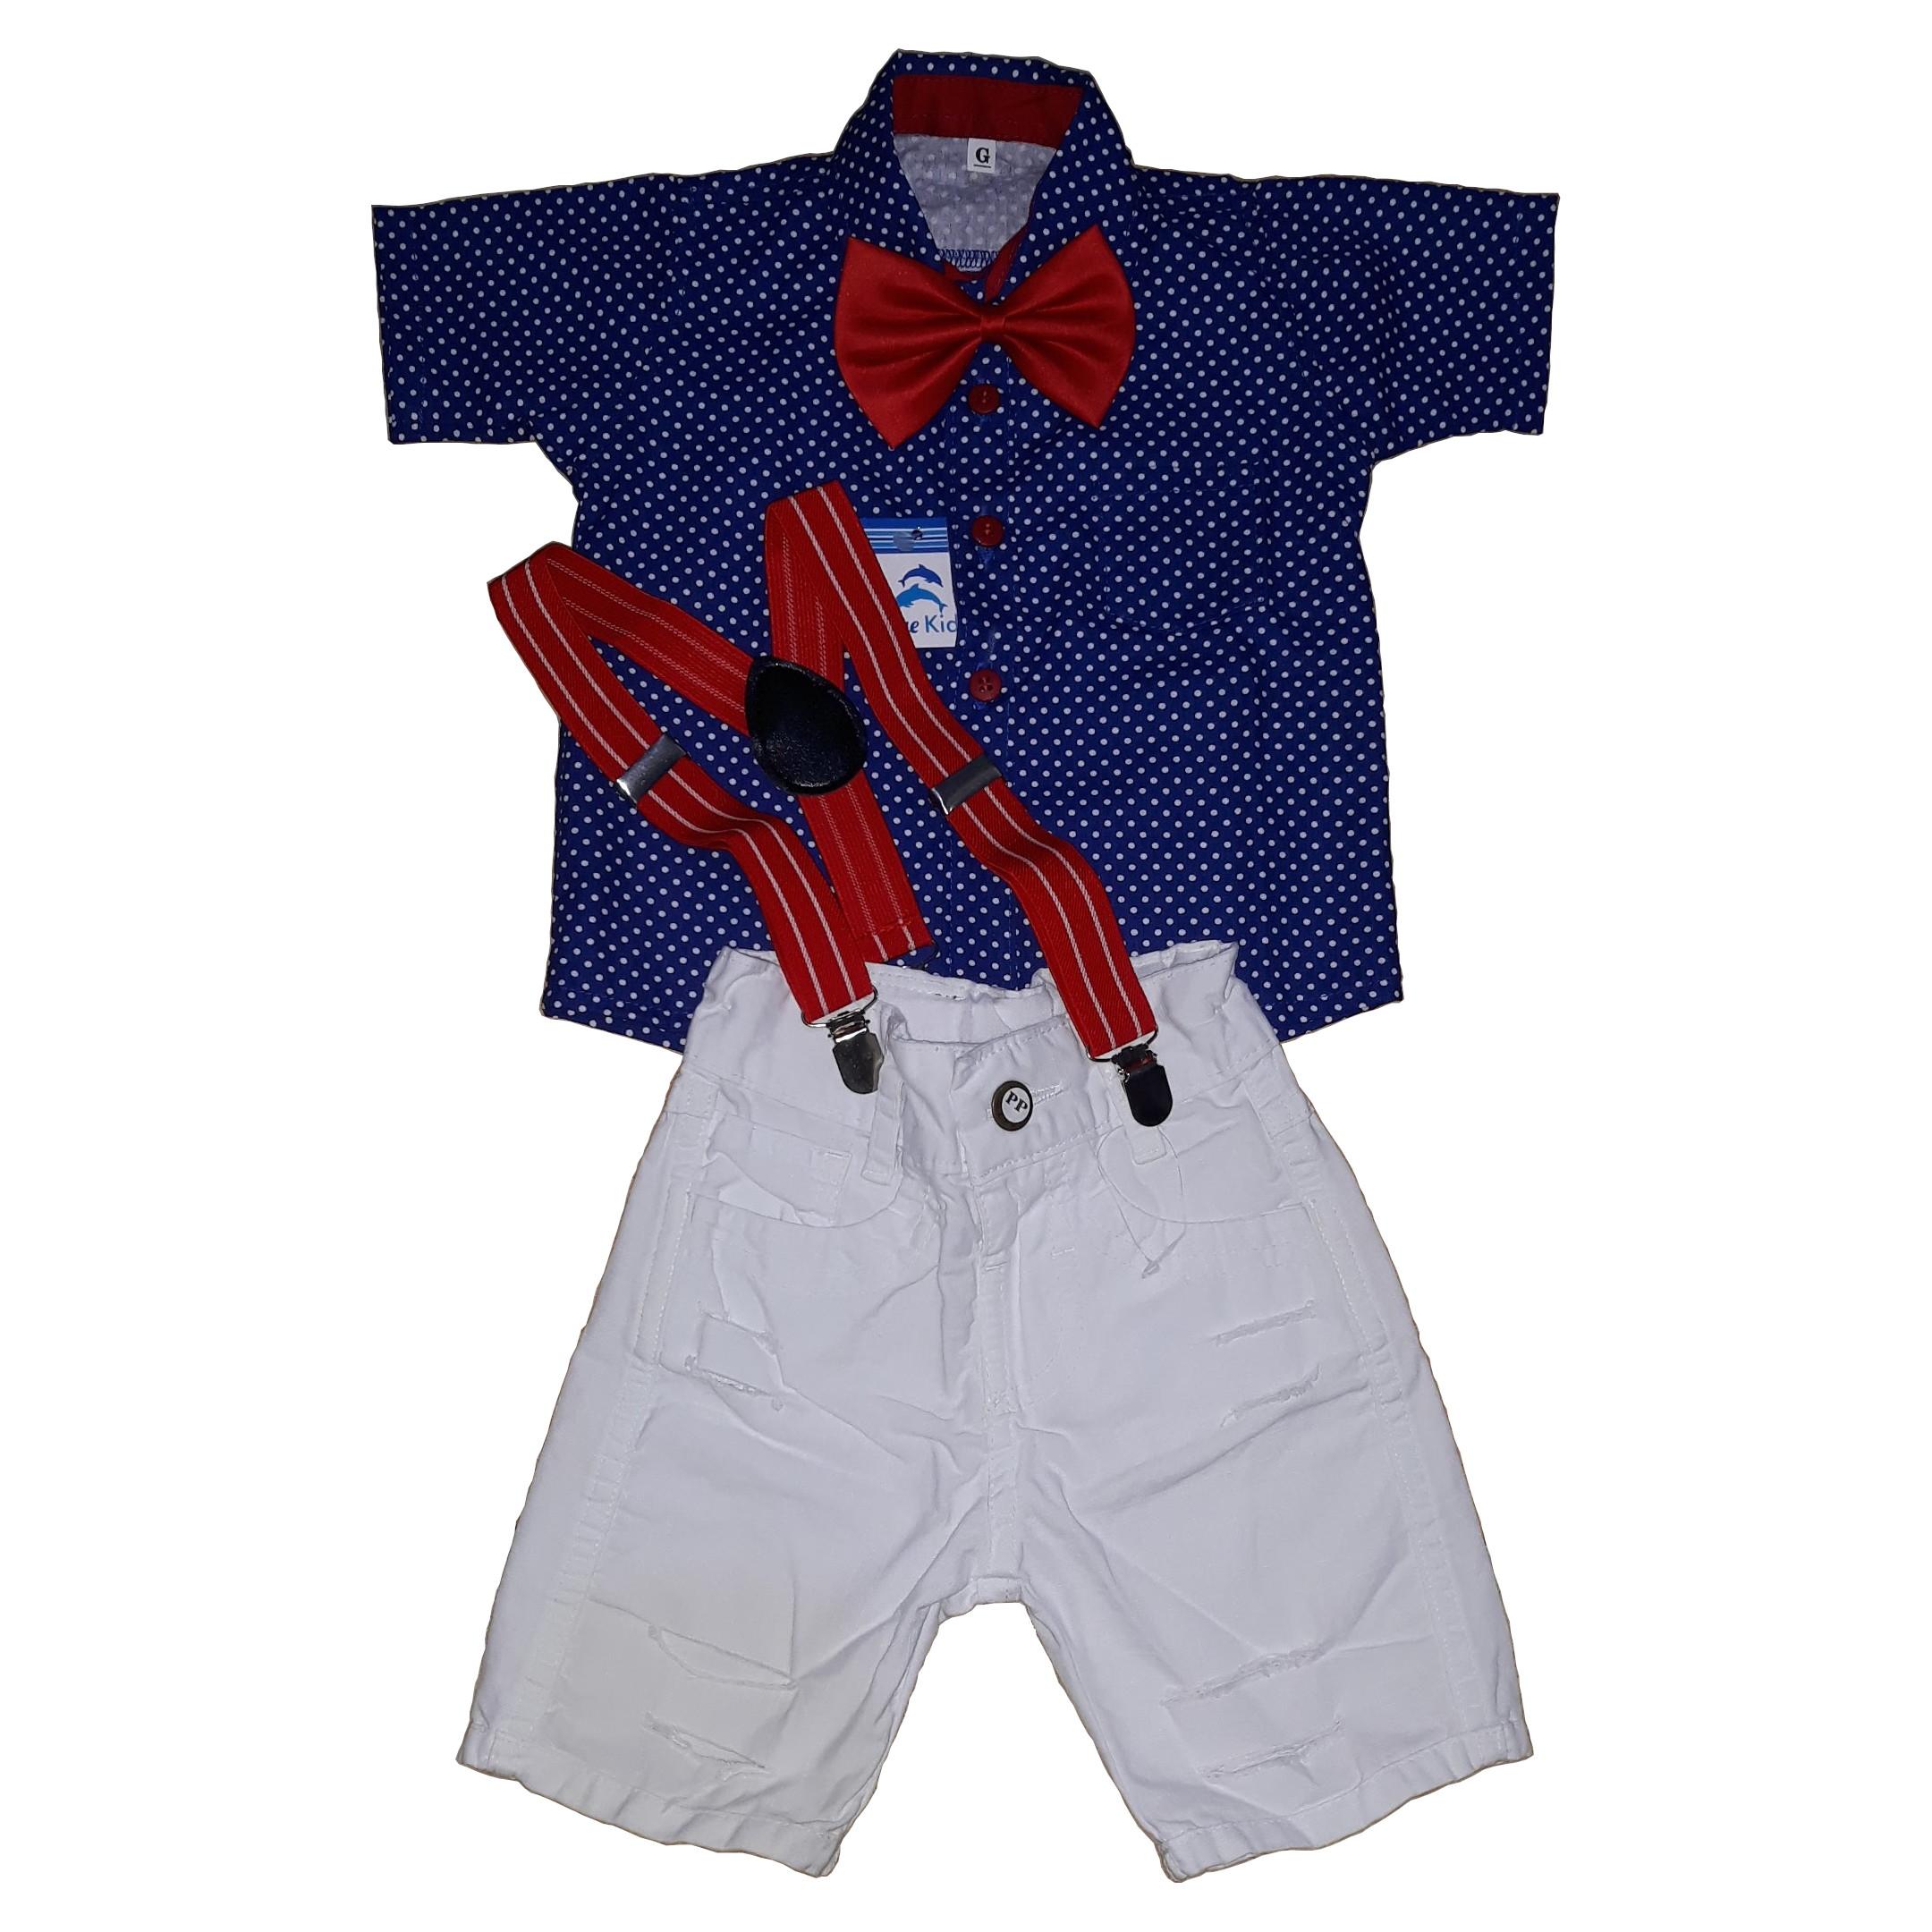 62edcedbf7 Conjunto Camisa Social Infantil Príncipe Bermuda Suspensori no Elo7 | Blue  Kids (D8FCA4)